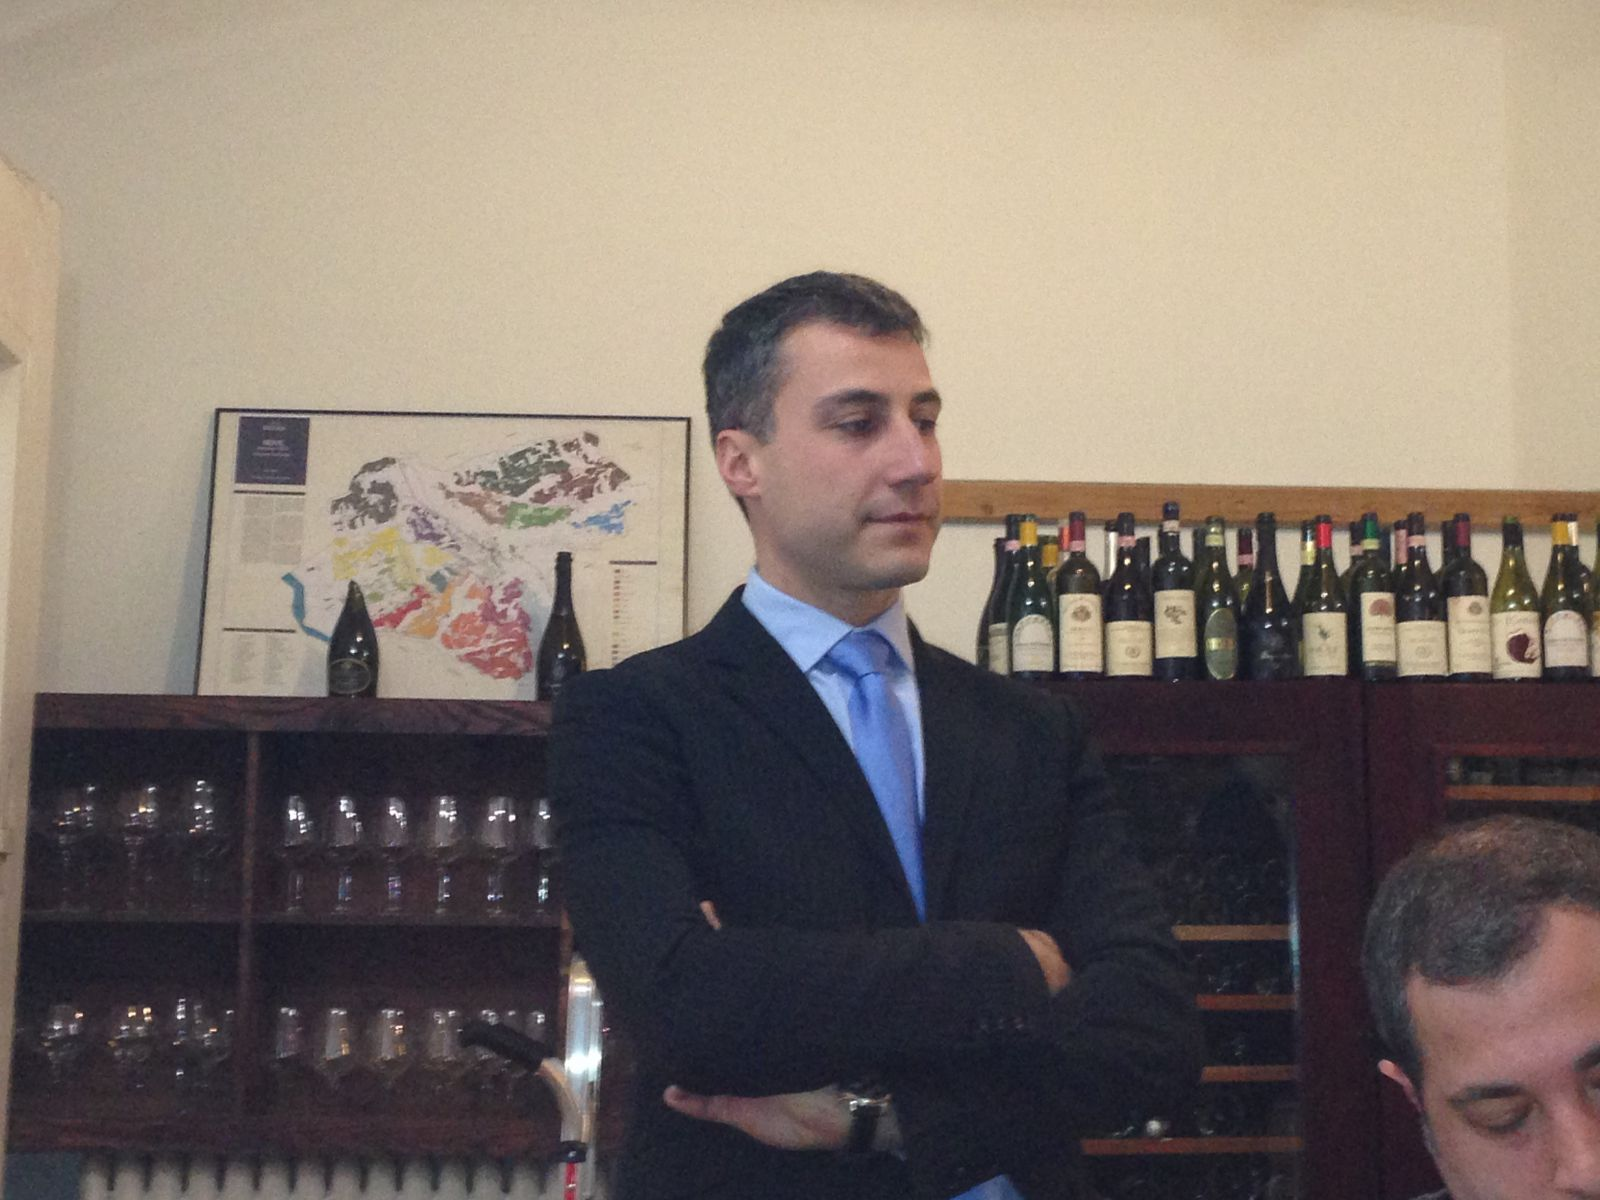 Il Conventino visit to Nyc, March